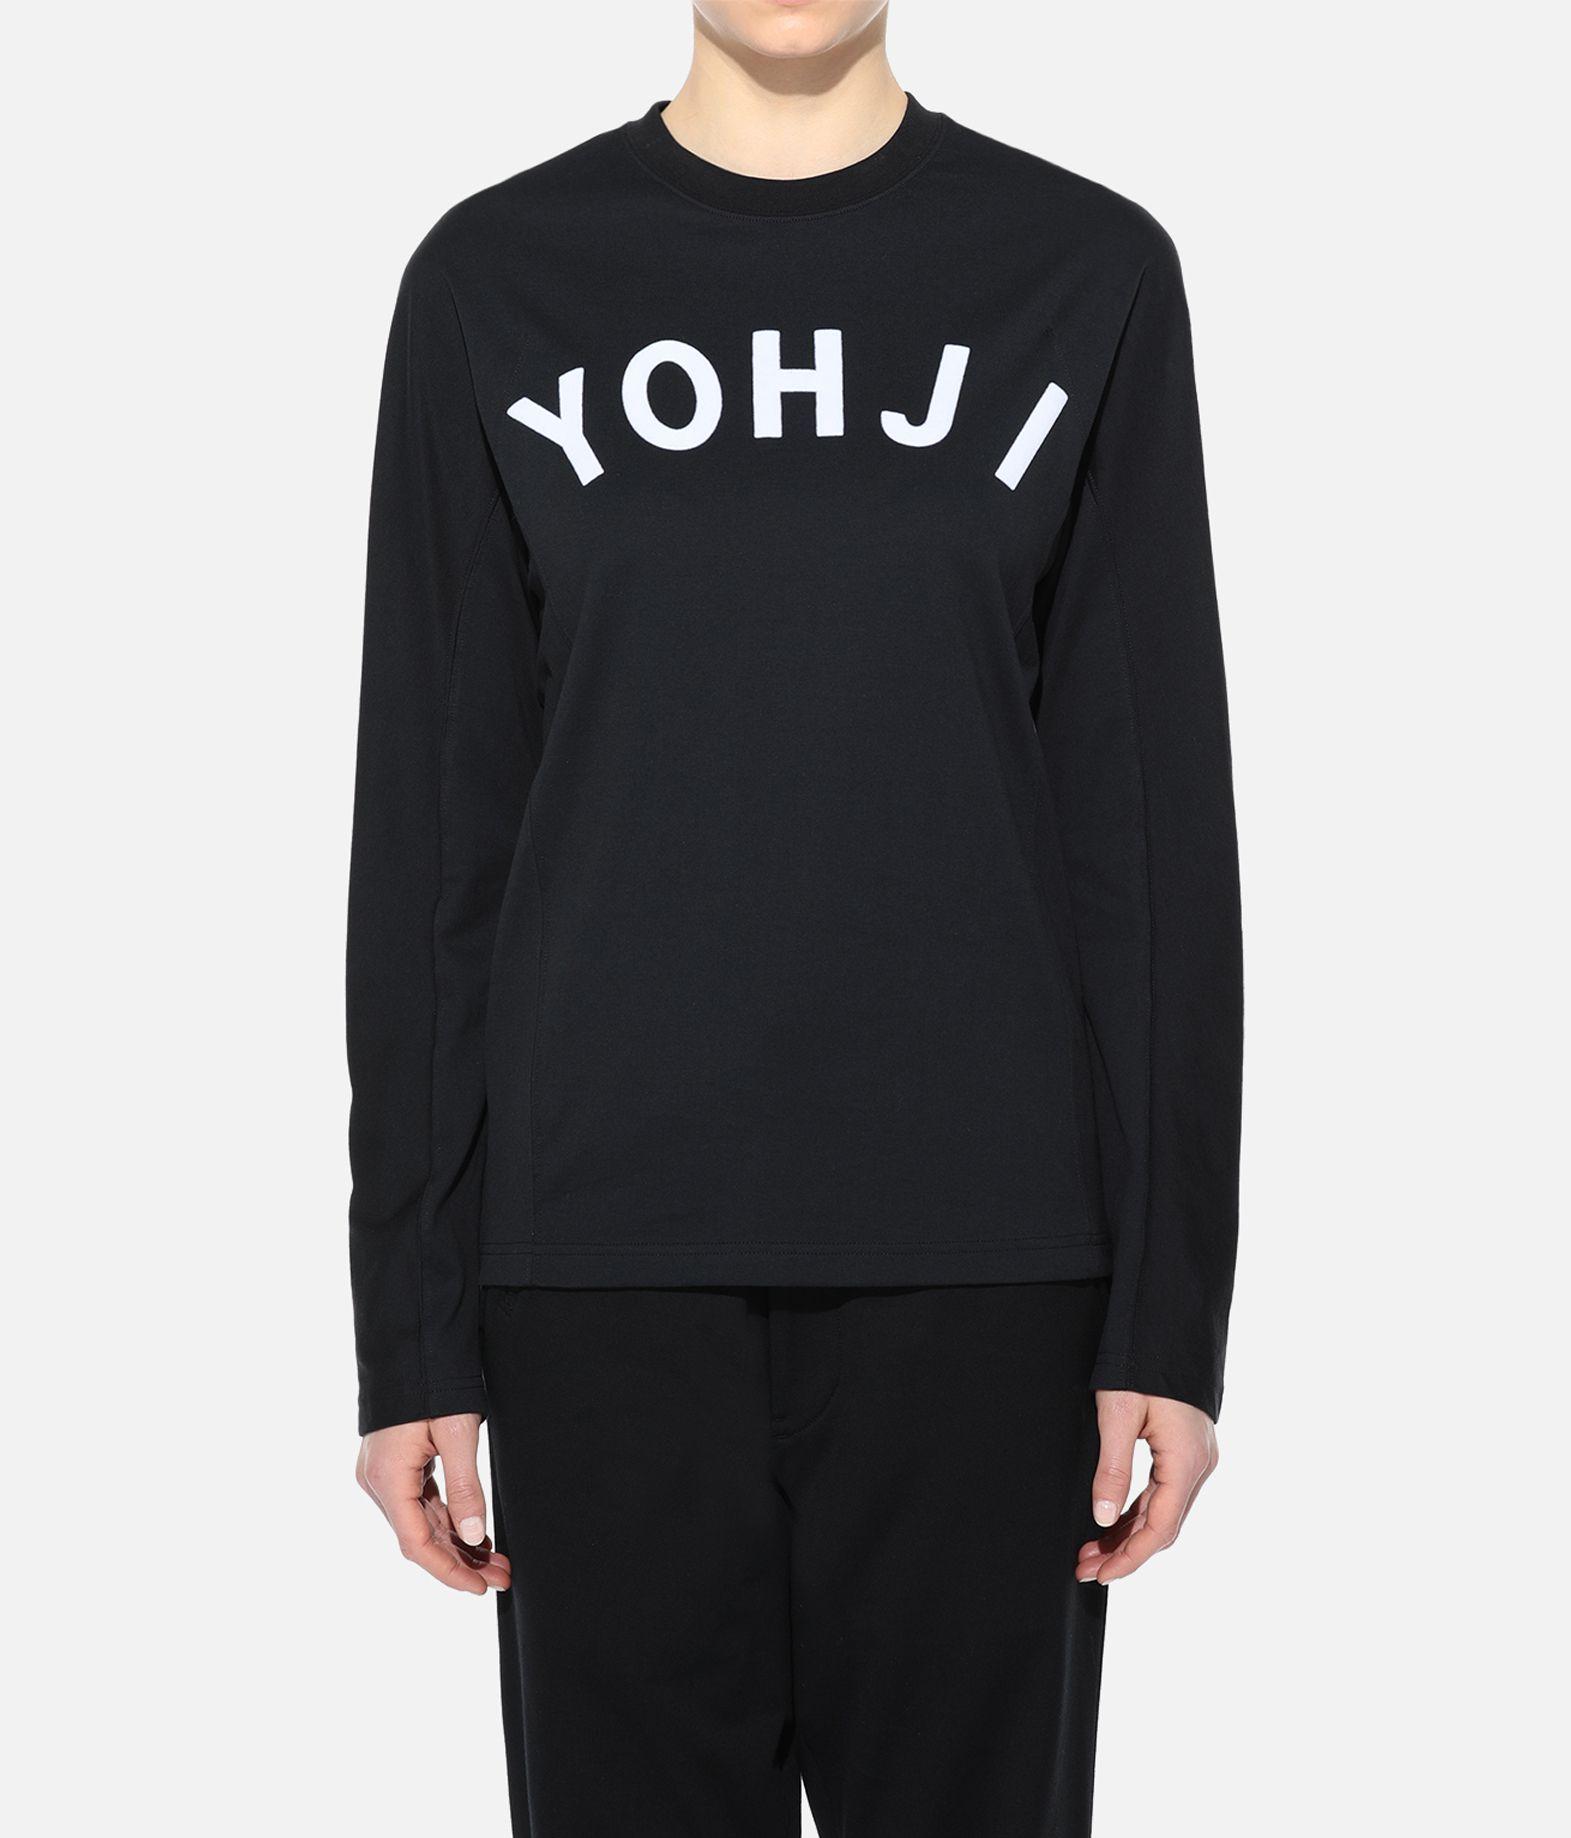 Y-3 Y-3 Yohji Letters Tee T-shirt maniche lunghe Donna r